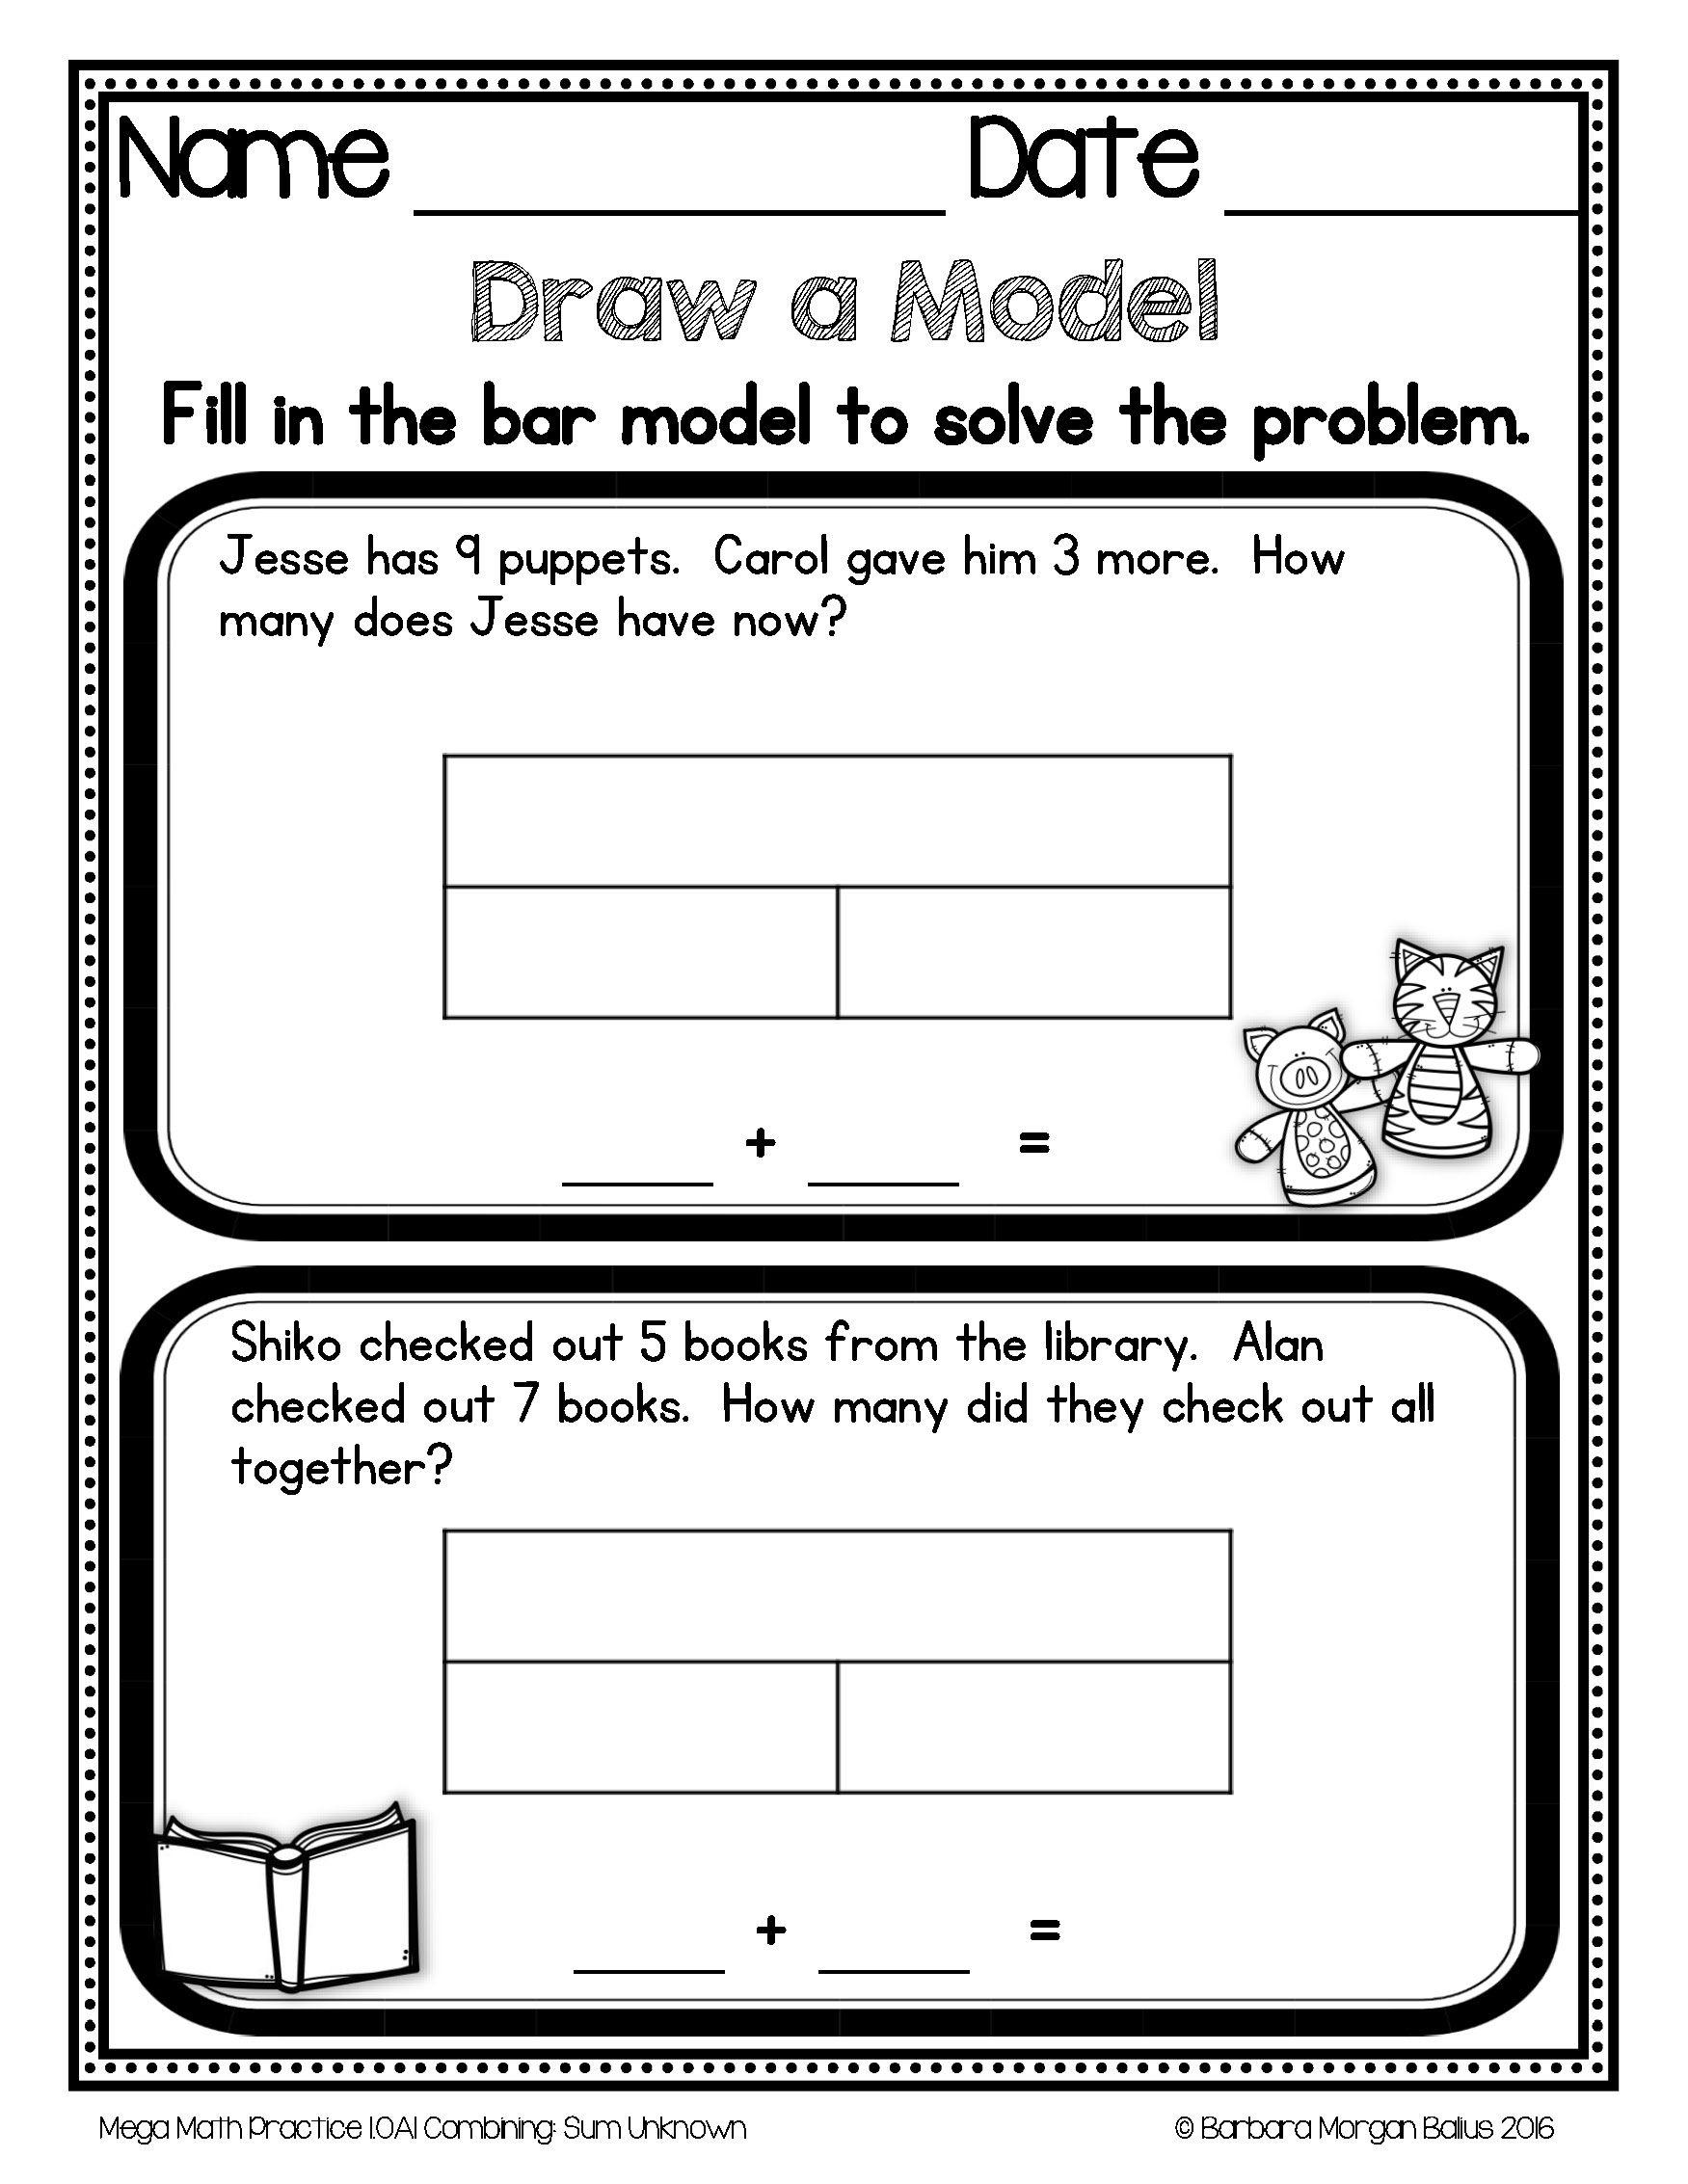 Digital Problem Solving Eleven Add Subtract Types 1 Oa 1 Math Practice Bundle Math Worksheets Bar Model Math Practices